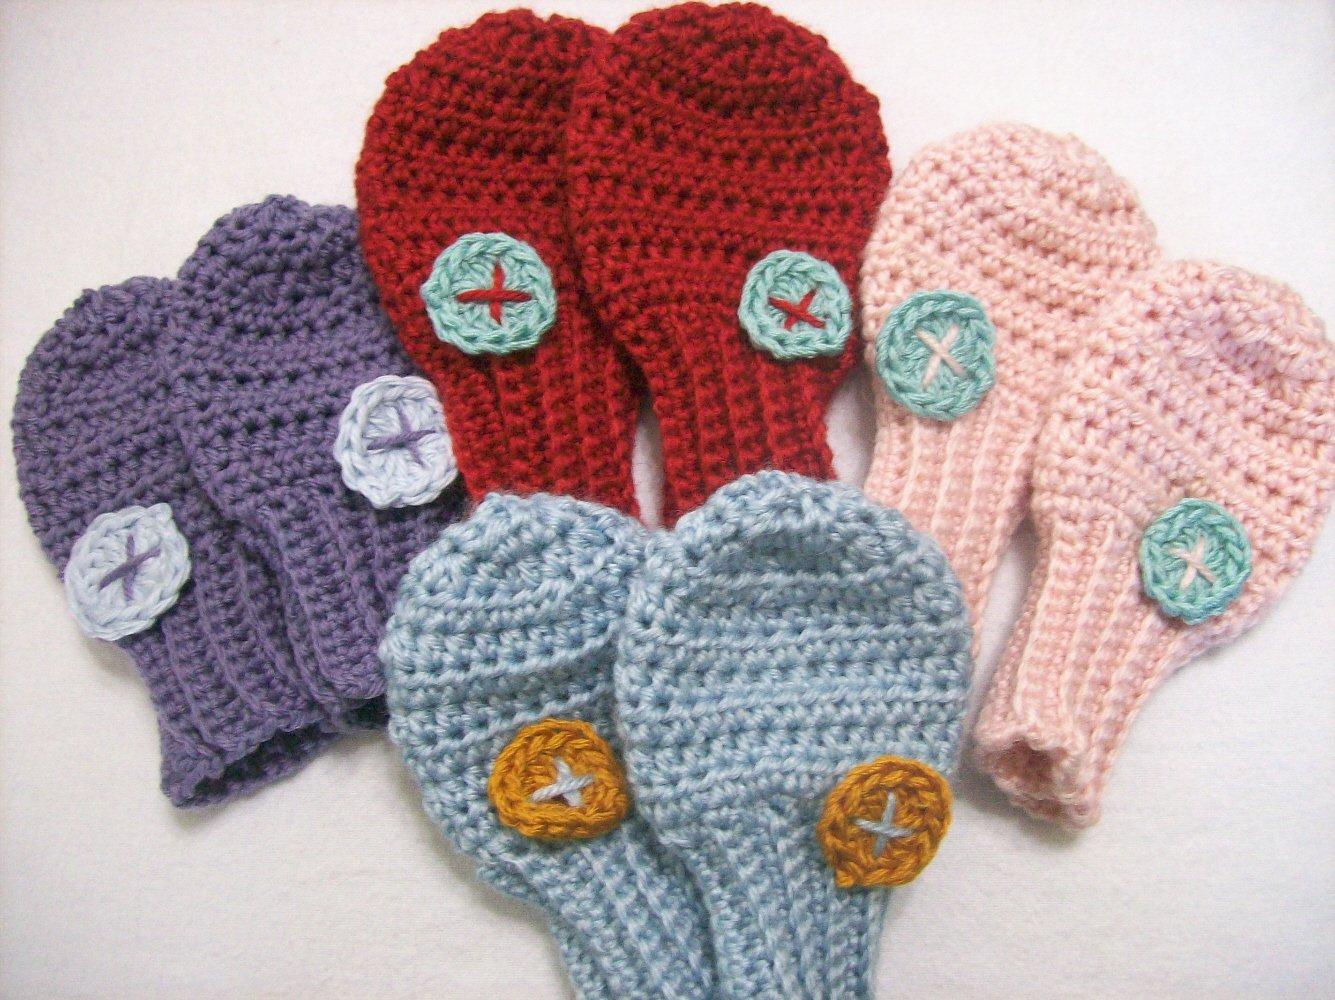 Baby shower gifts to crochet, baby mitten crochet pattern from Banana Moon Studio